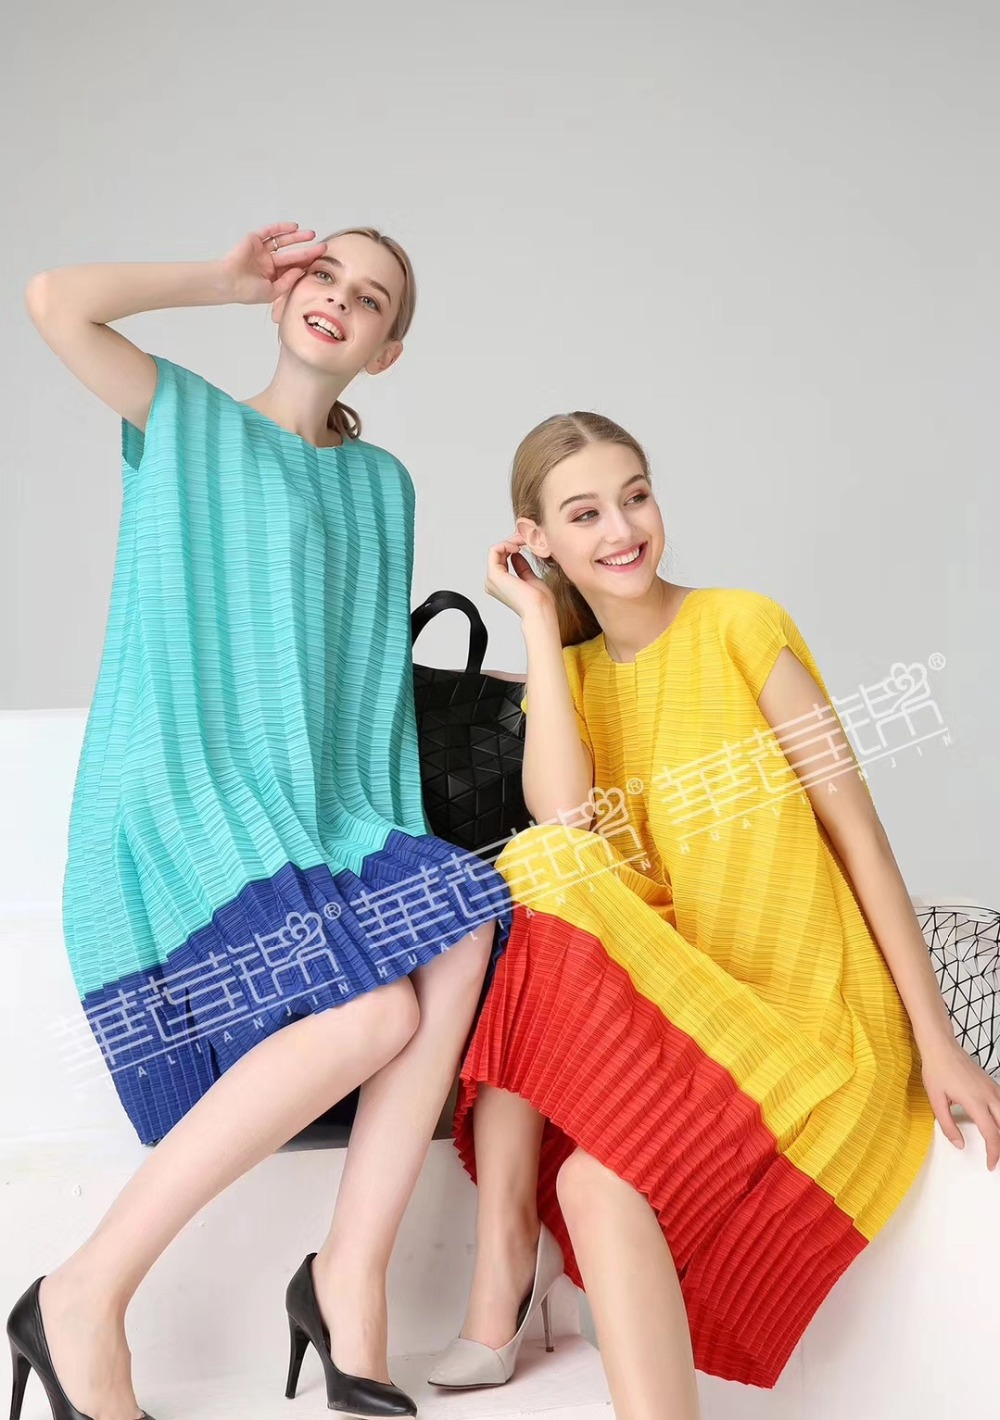 LIVRAISON GRATUITE Miyake fasion fold mode manches courtes o-cou robe droite en stock